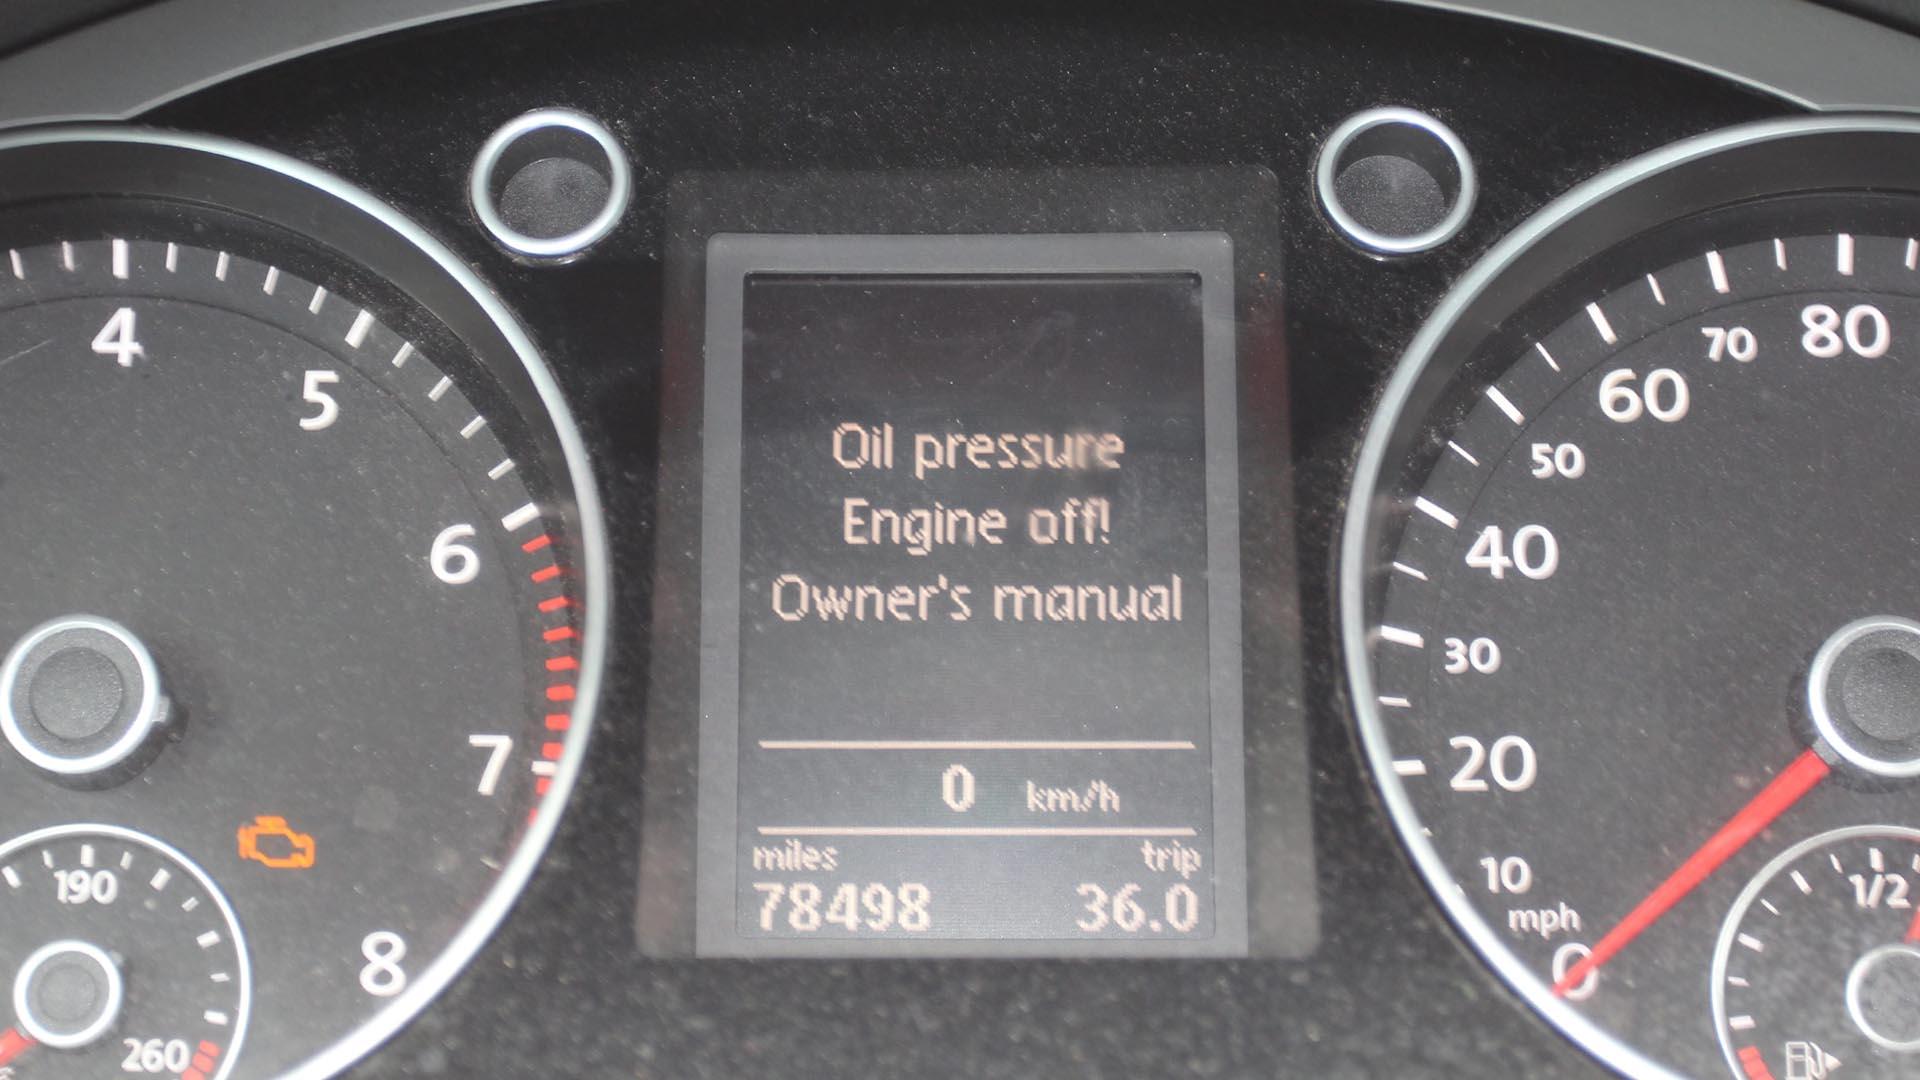 Diagnosing Low Oil Pressure On A VW CC TSI (Volkswagen EA888 2.0 TSI)